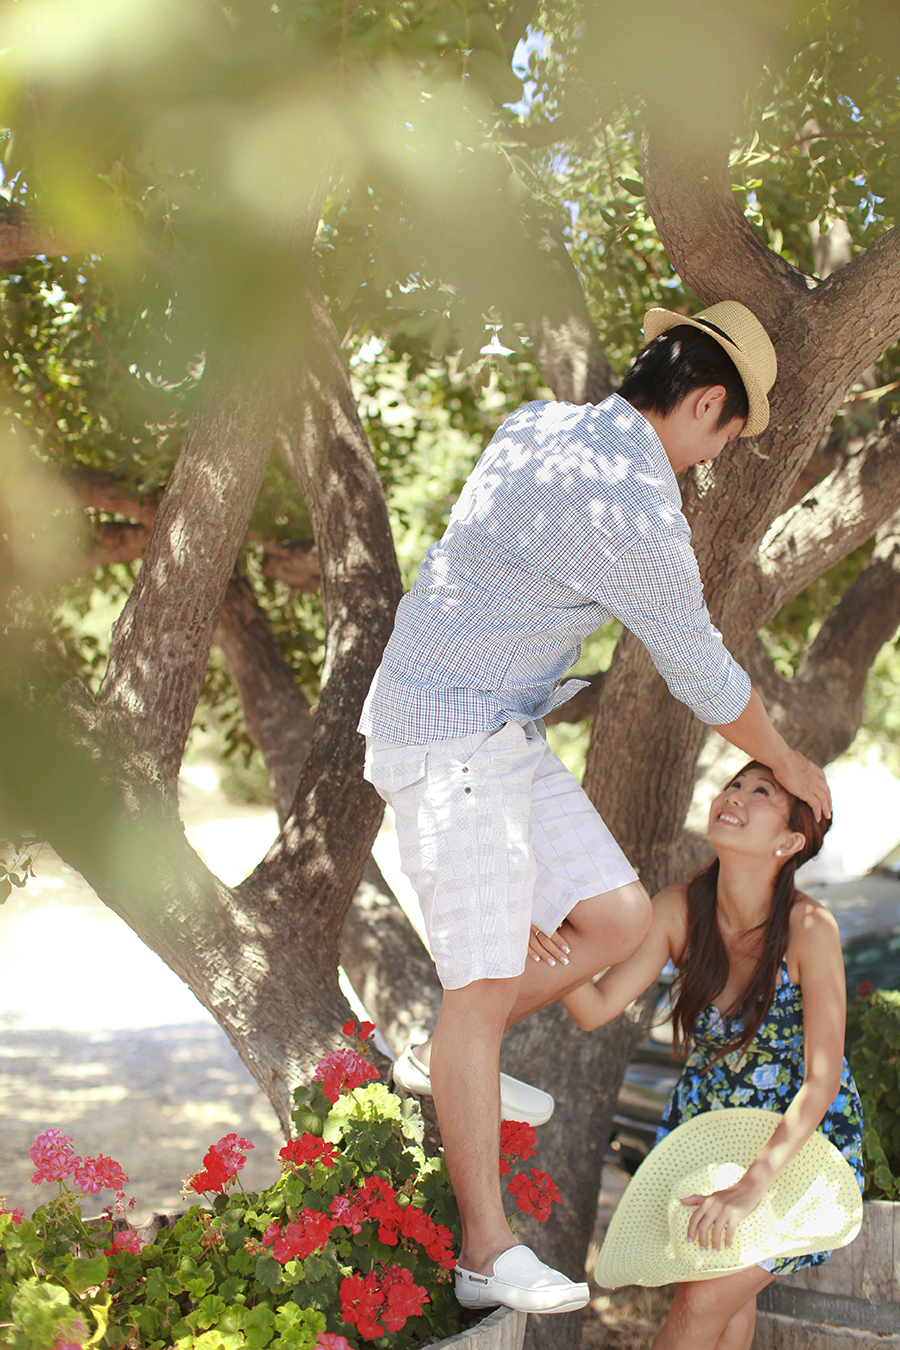 santorini greece . wedding photography by kurt ahs . 3095.jpg